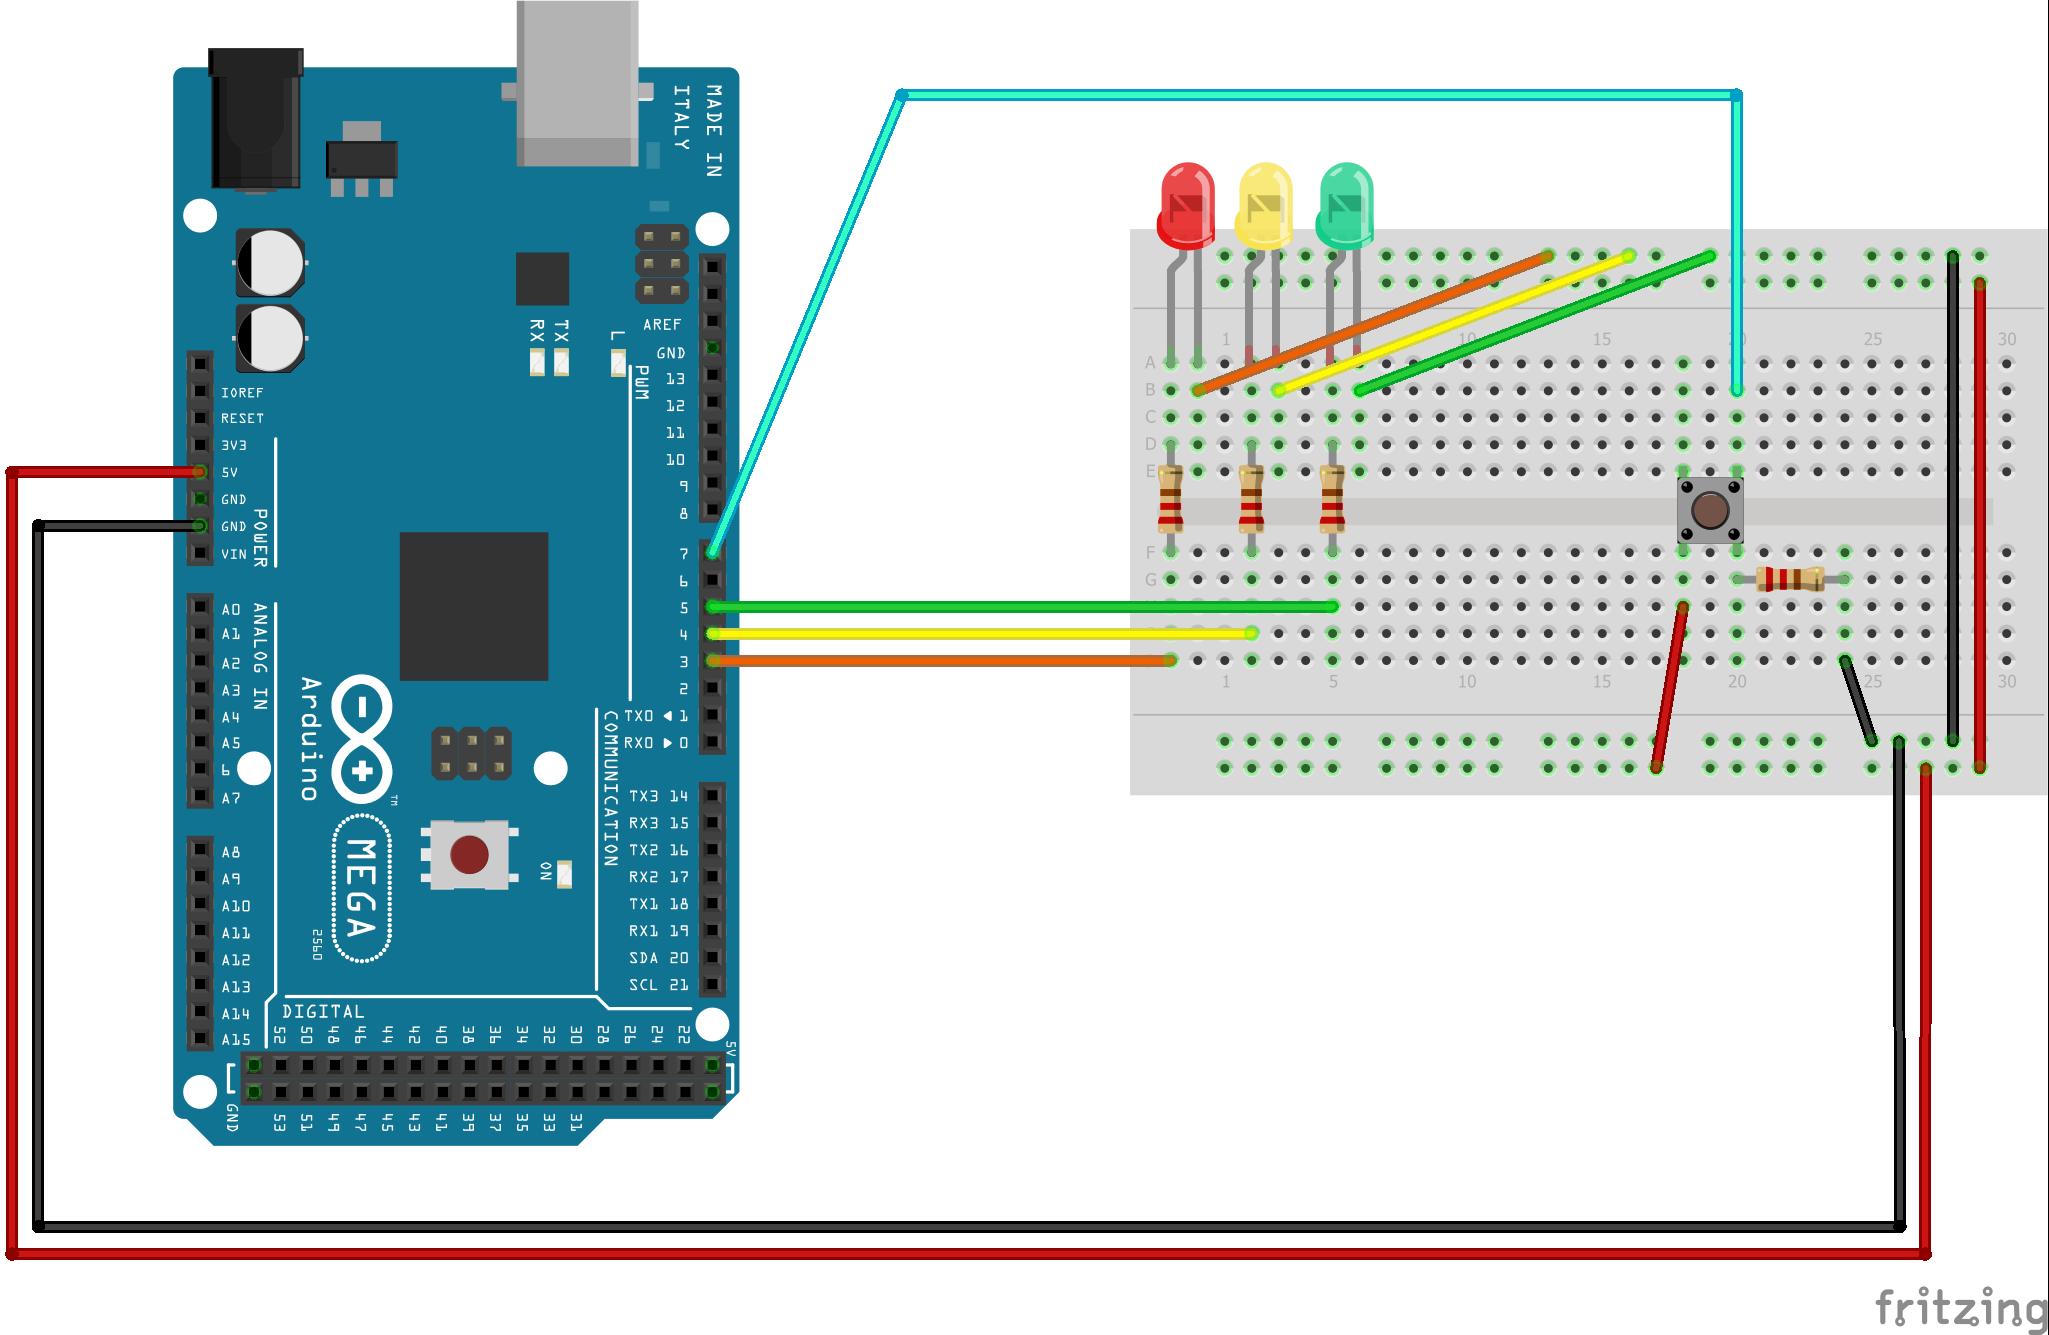 Stop Light Circuit Diagram Tinkercad - Wiring